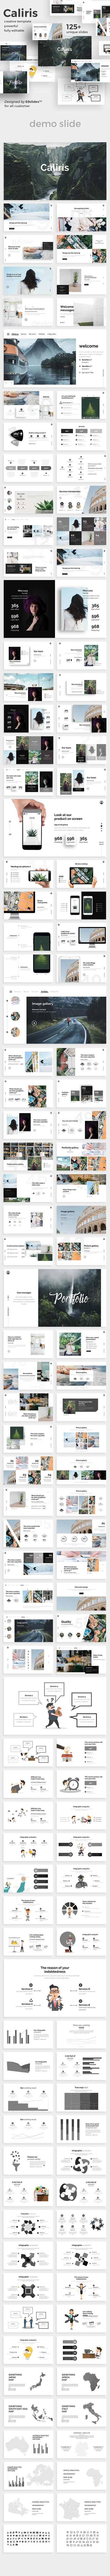 Caliris Creative Powerpoint Template - Creative PowerPoint Templates